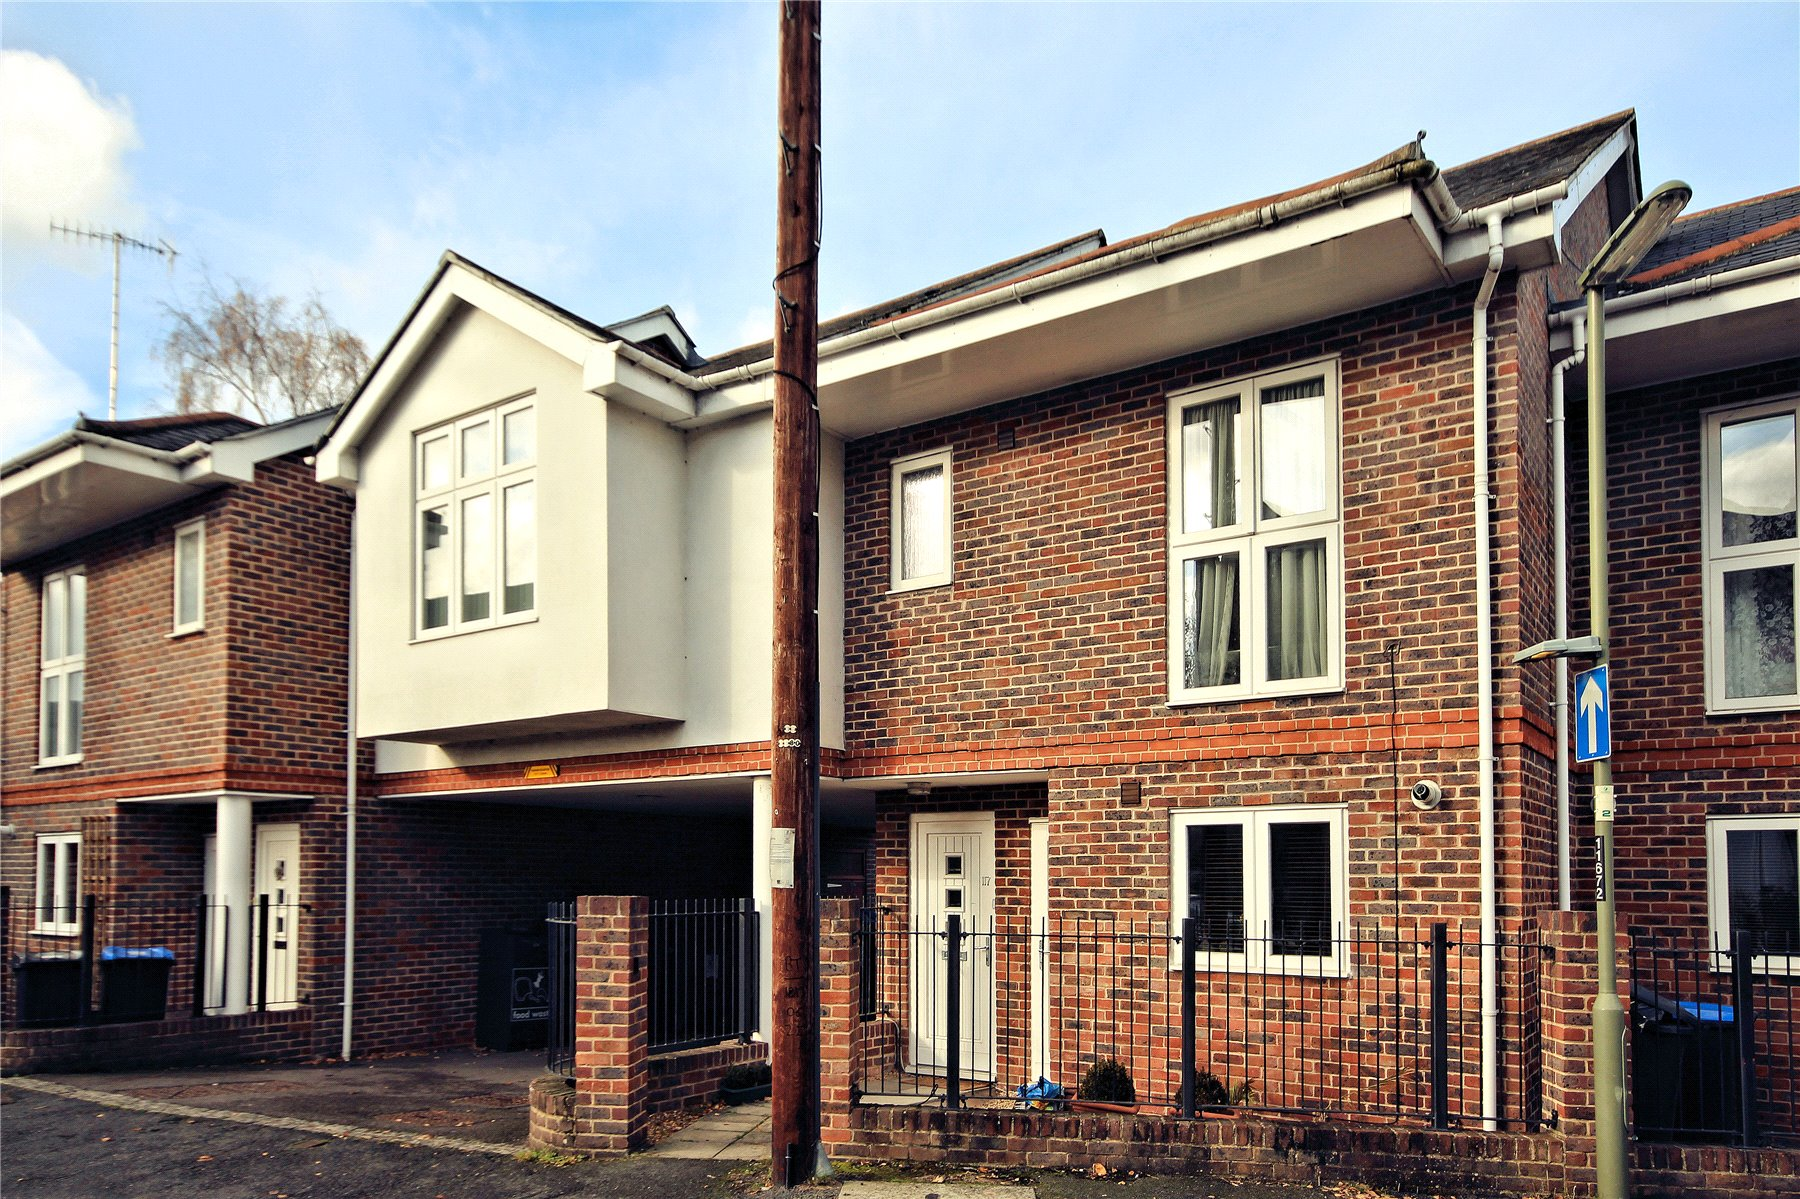 3 Bedrooms Terraced House for sale in Vale Farm Road, Woking, Surrey, GU21